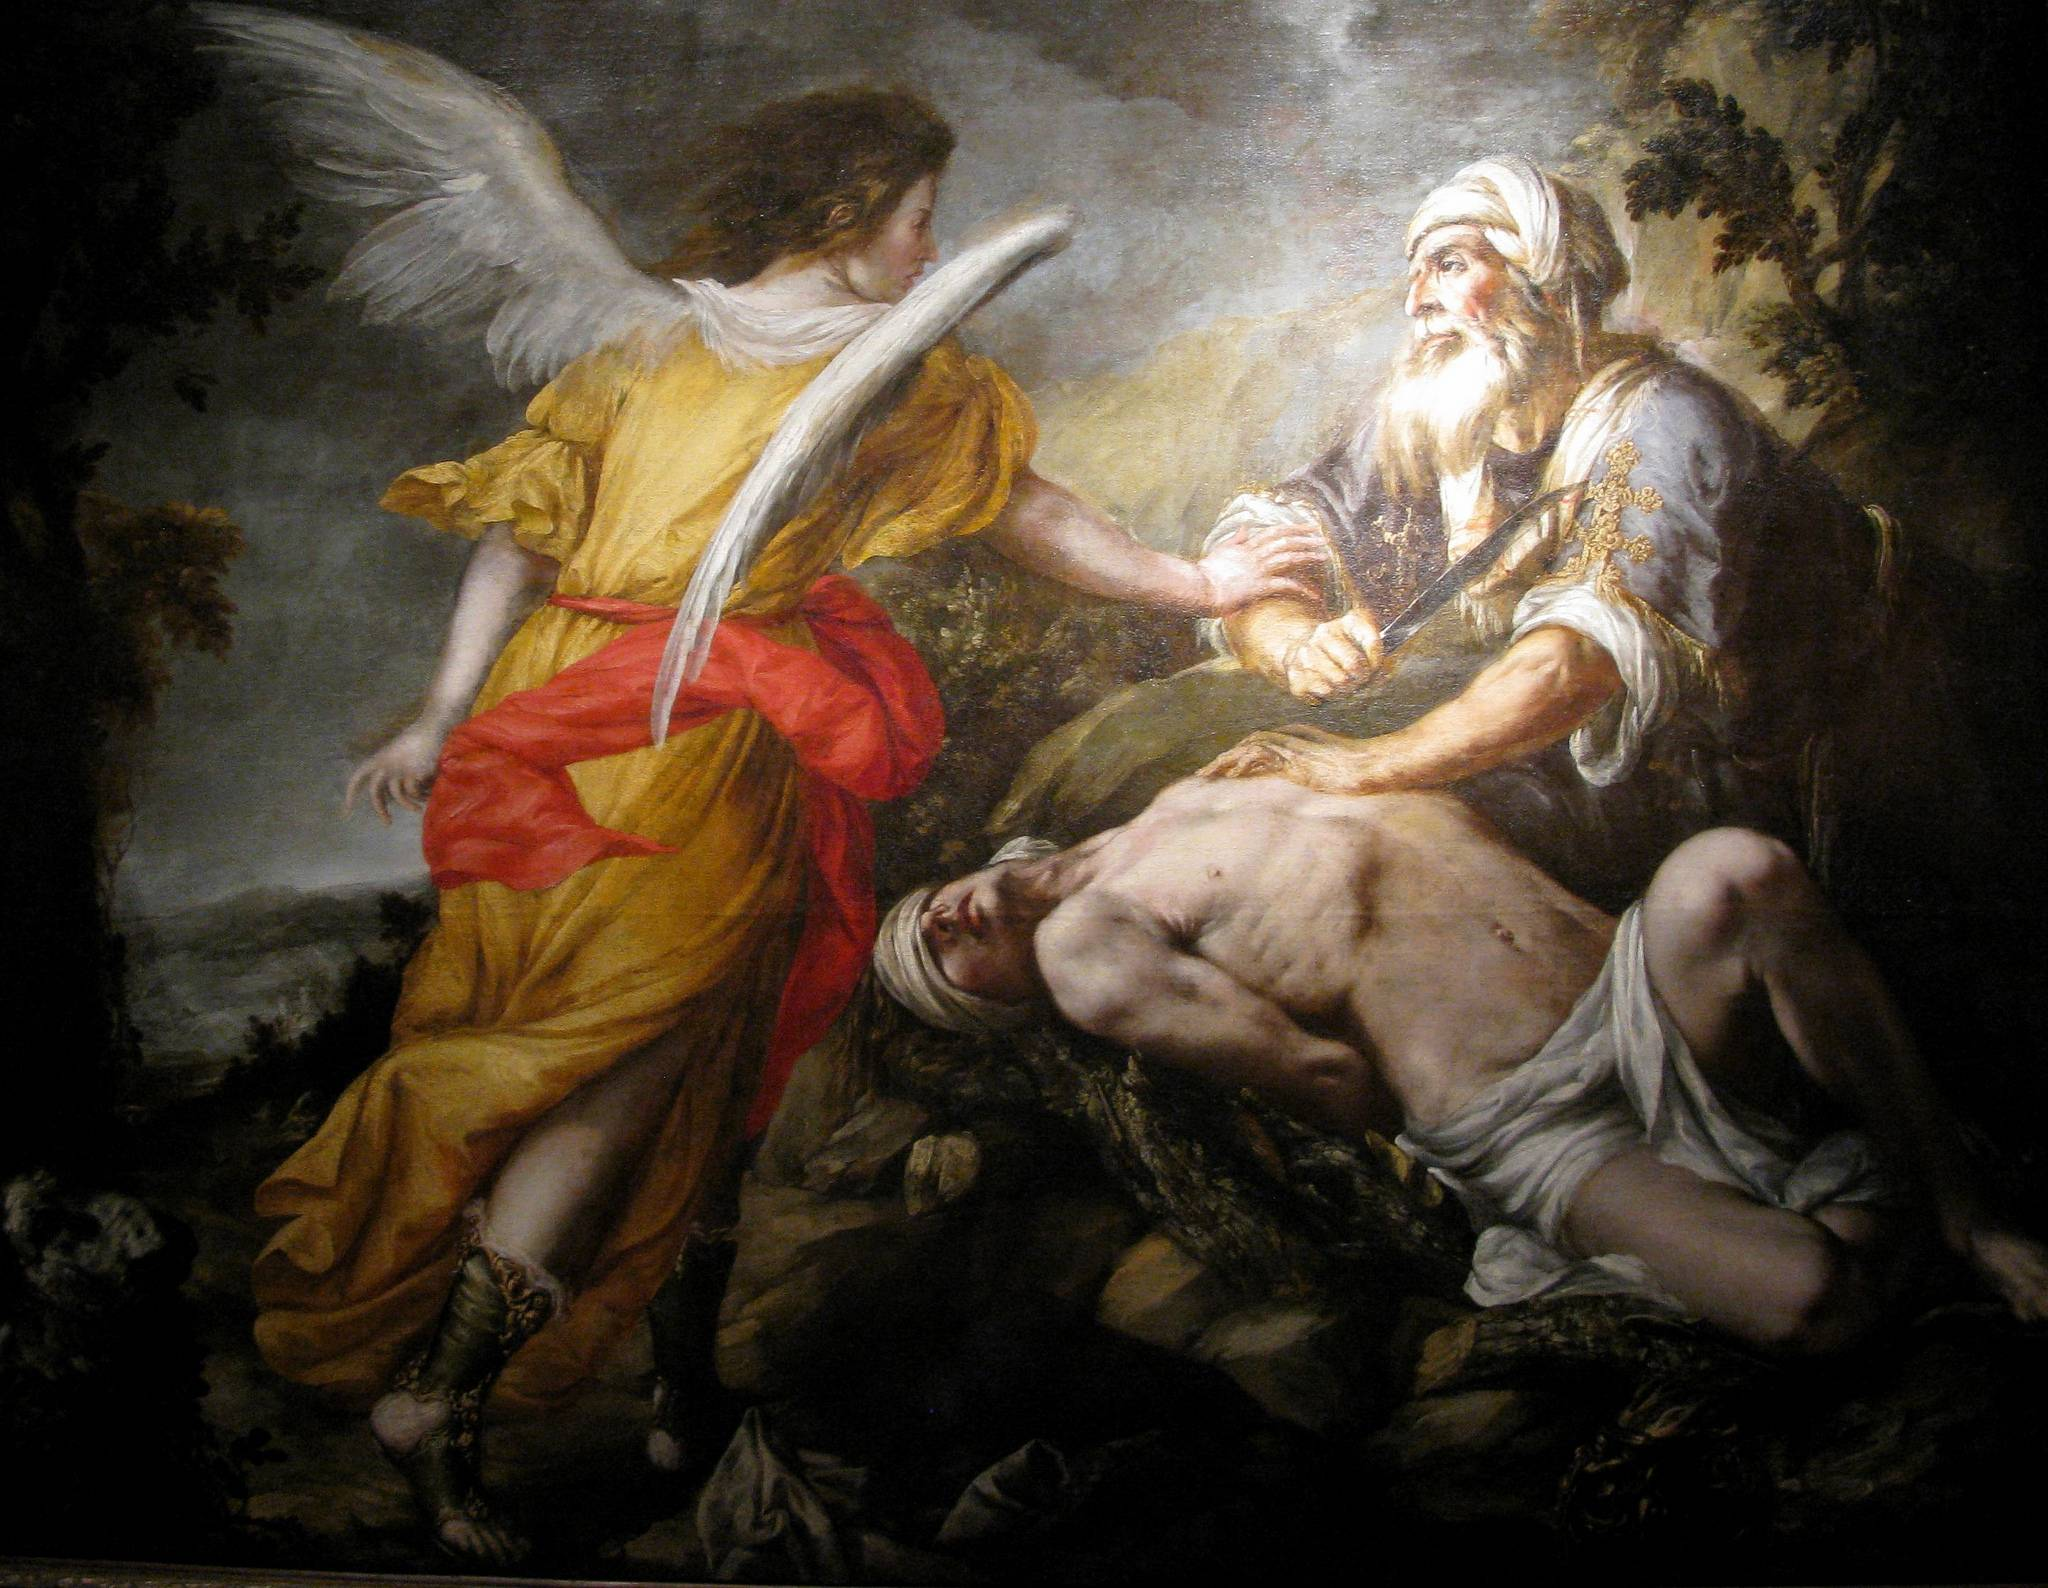 Молитва архангелу михаилу от темных сил